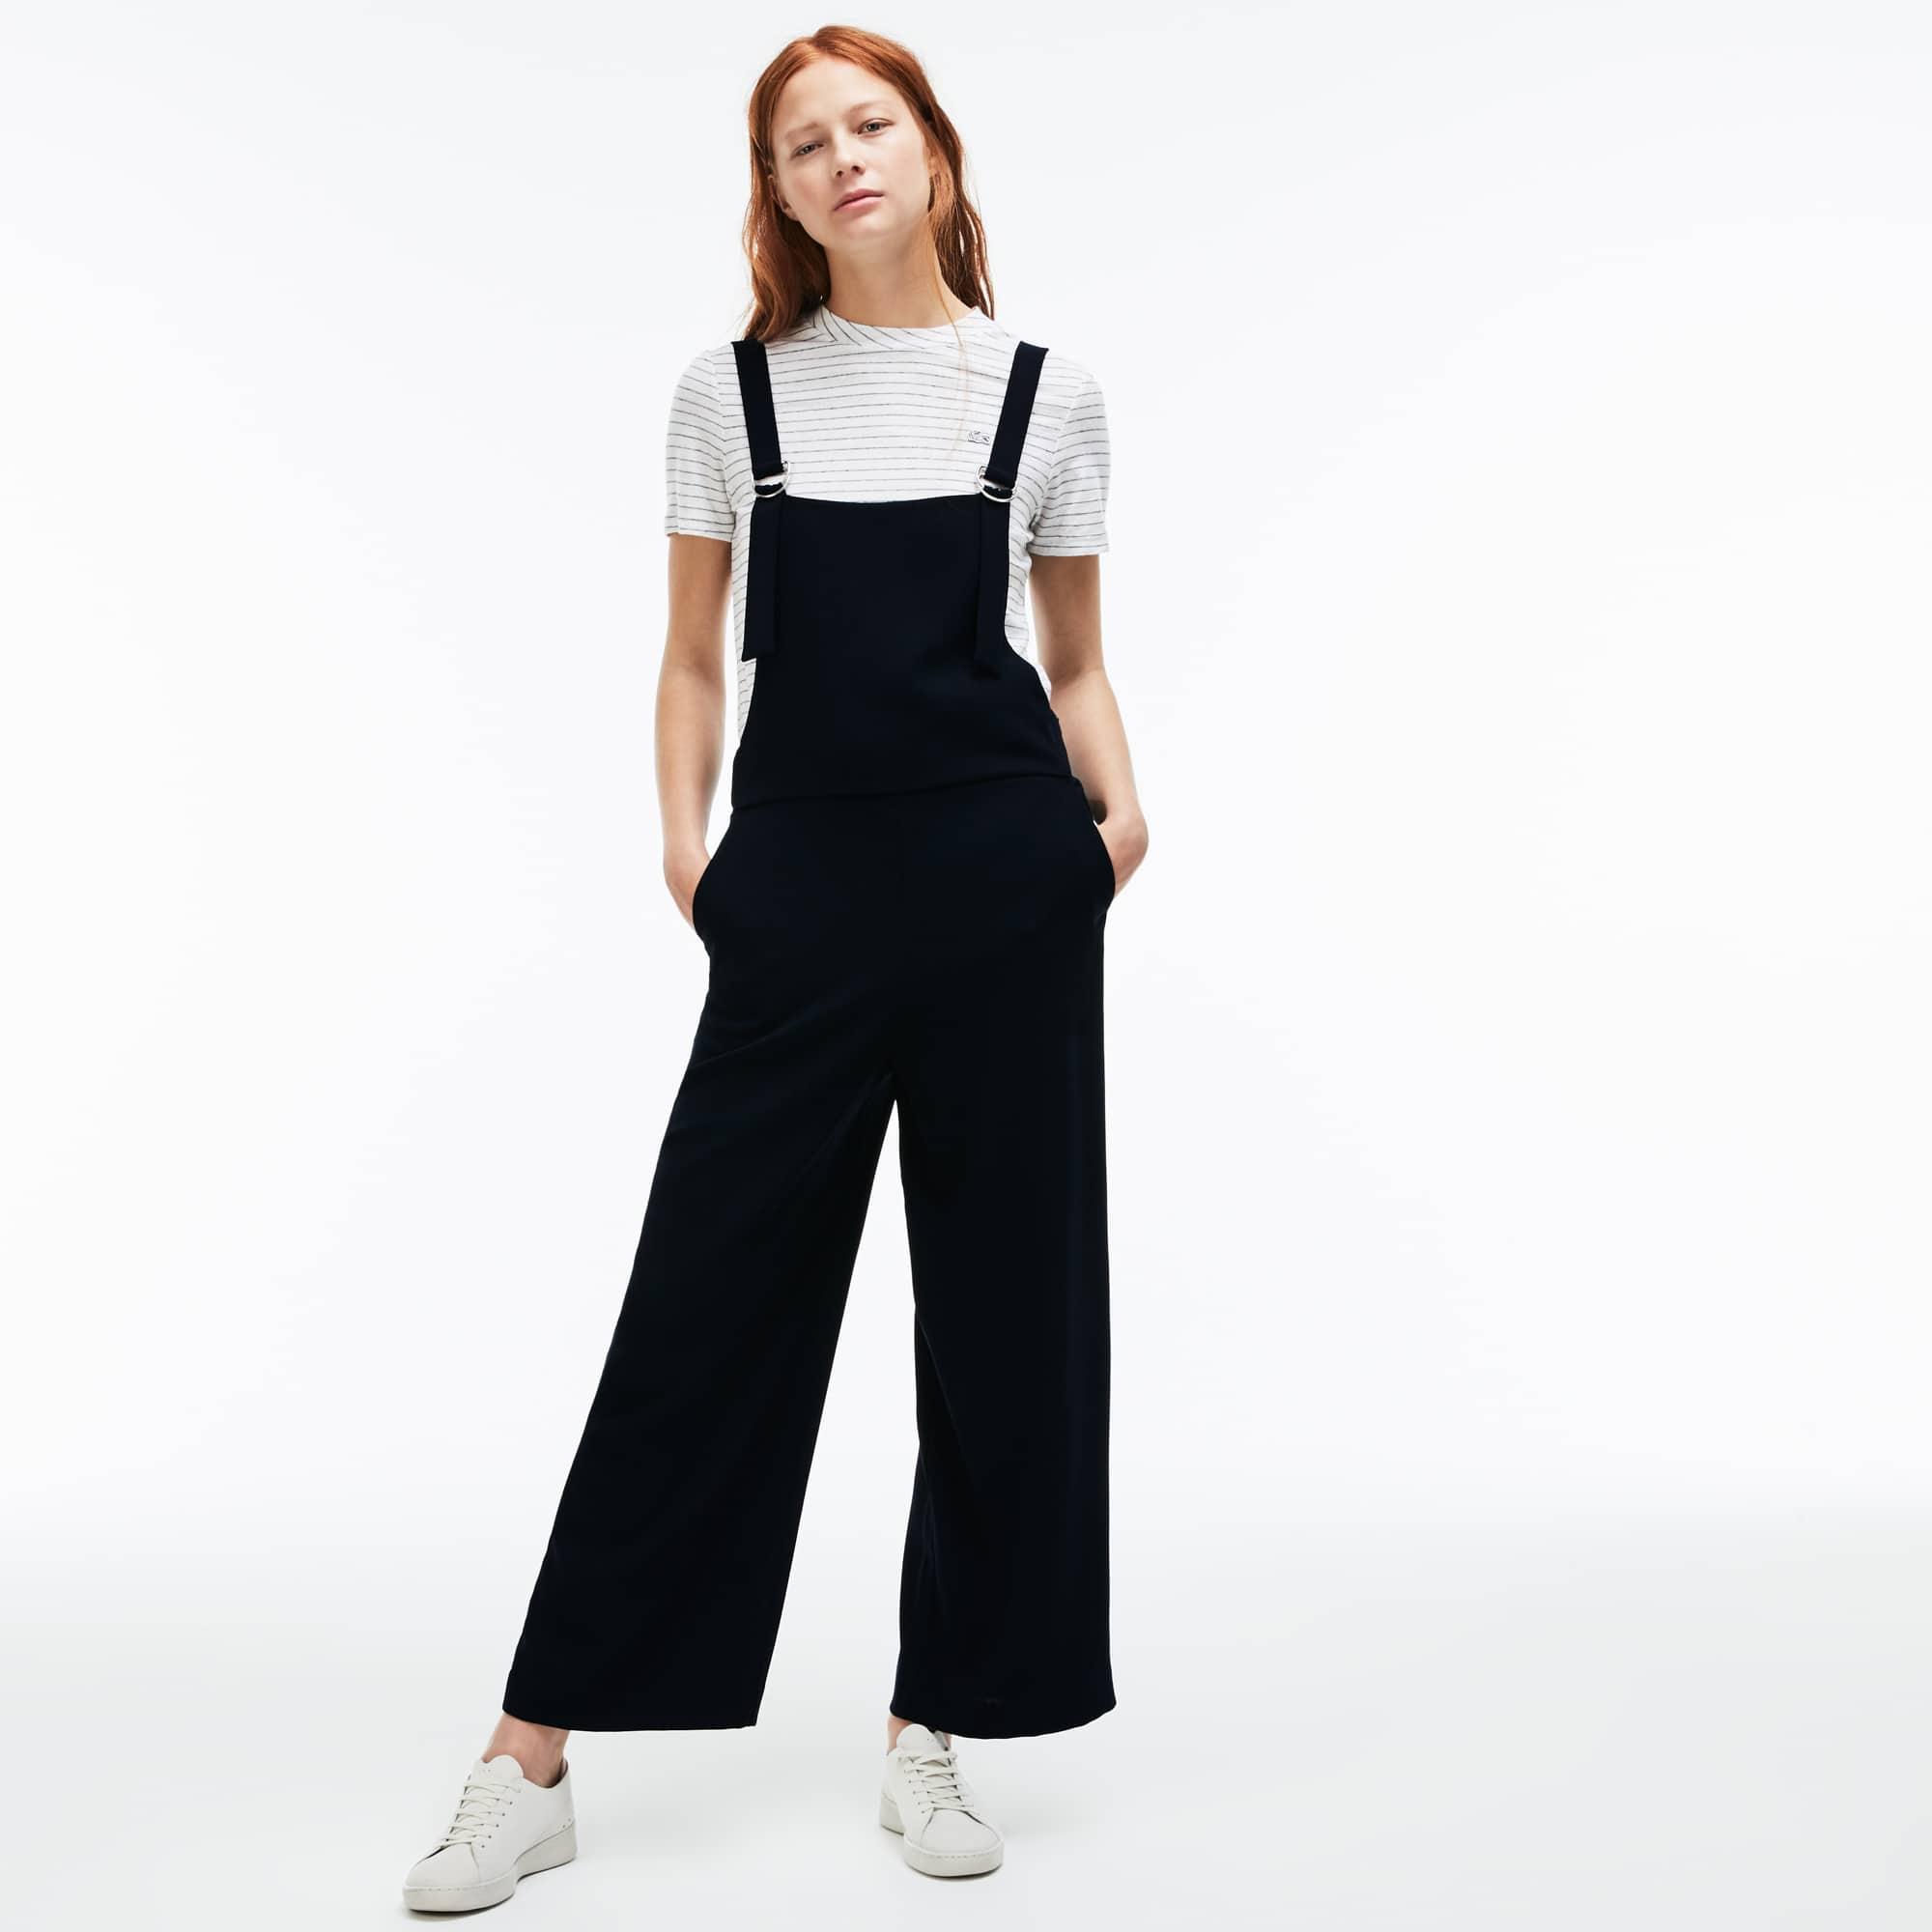 Damen-Overall aus Krepp LACOSTE L!VE